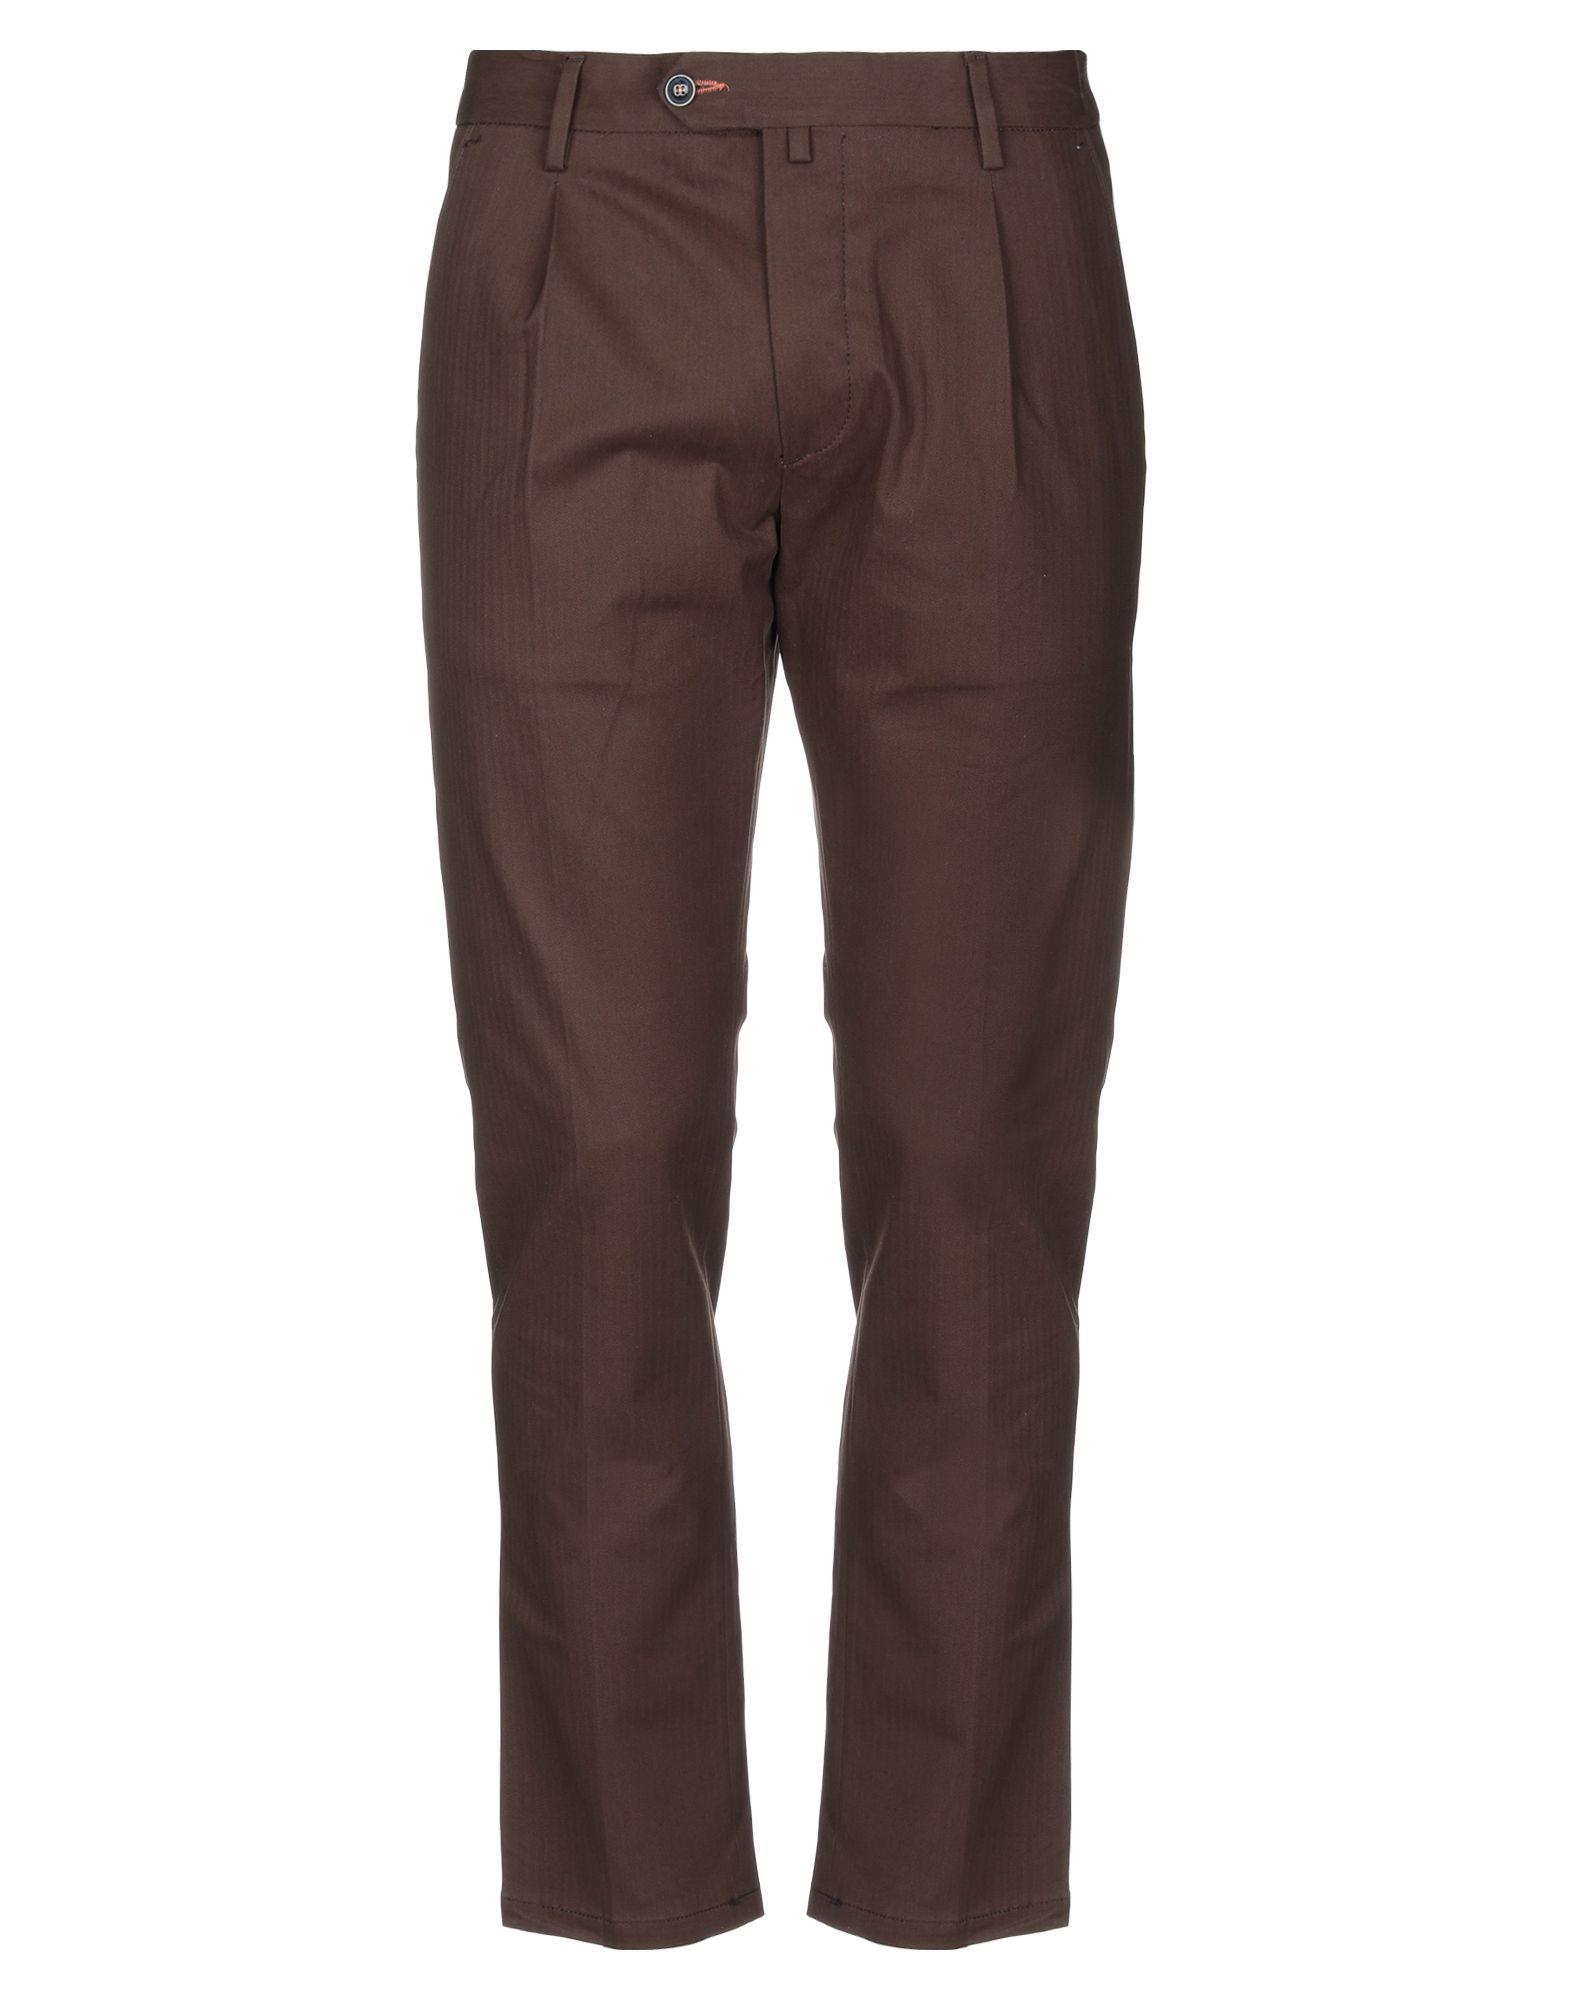 Pantalone Bogheri herren - 13348488JX